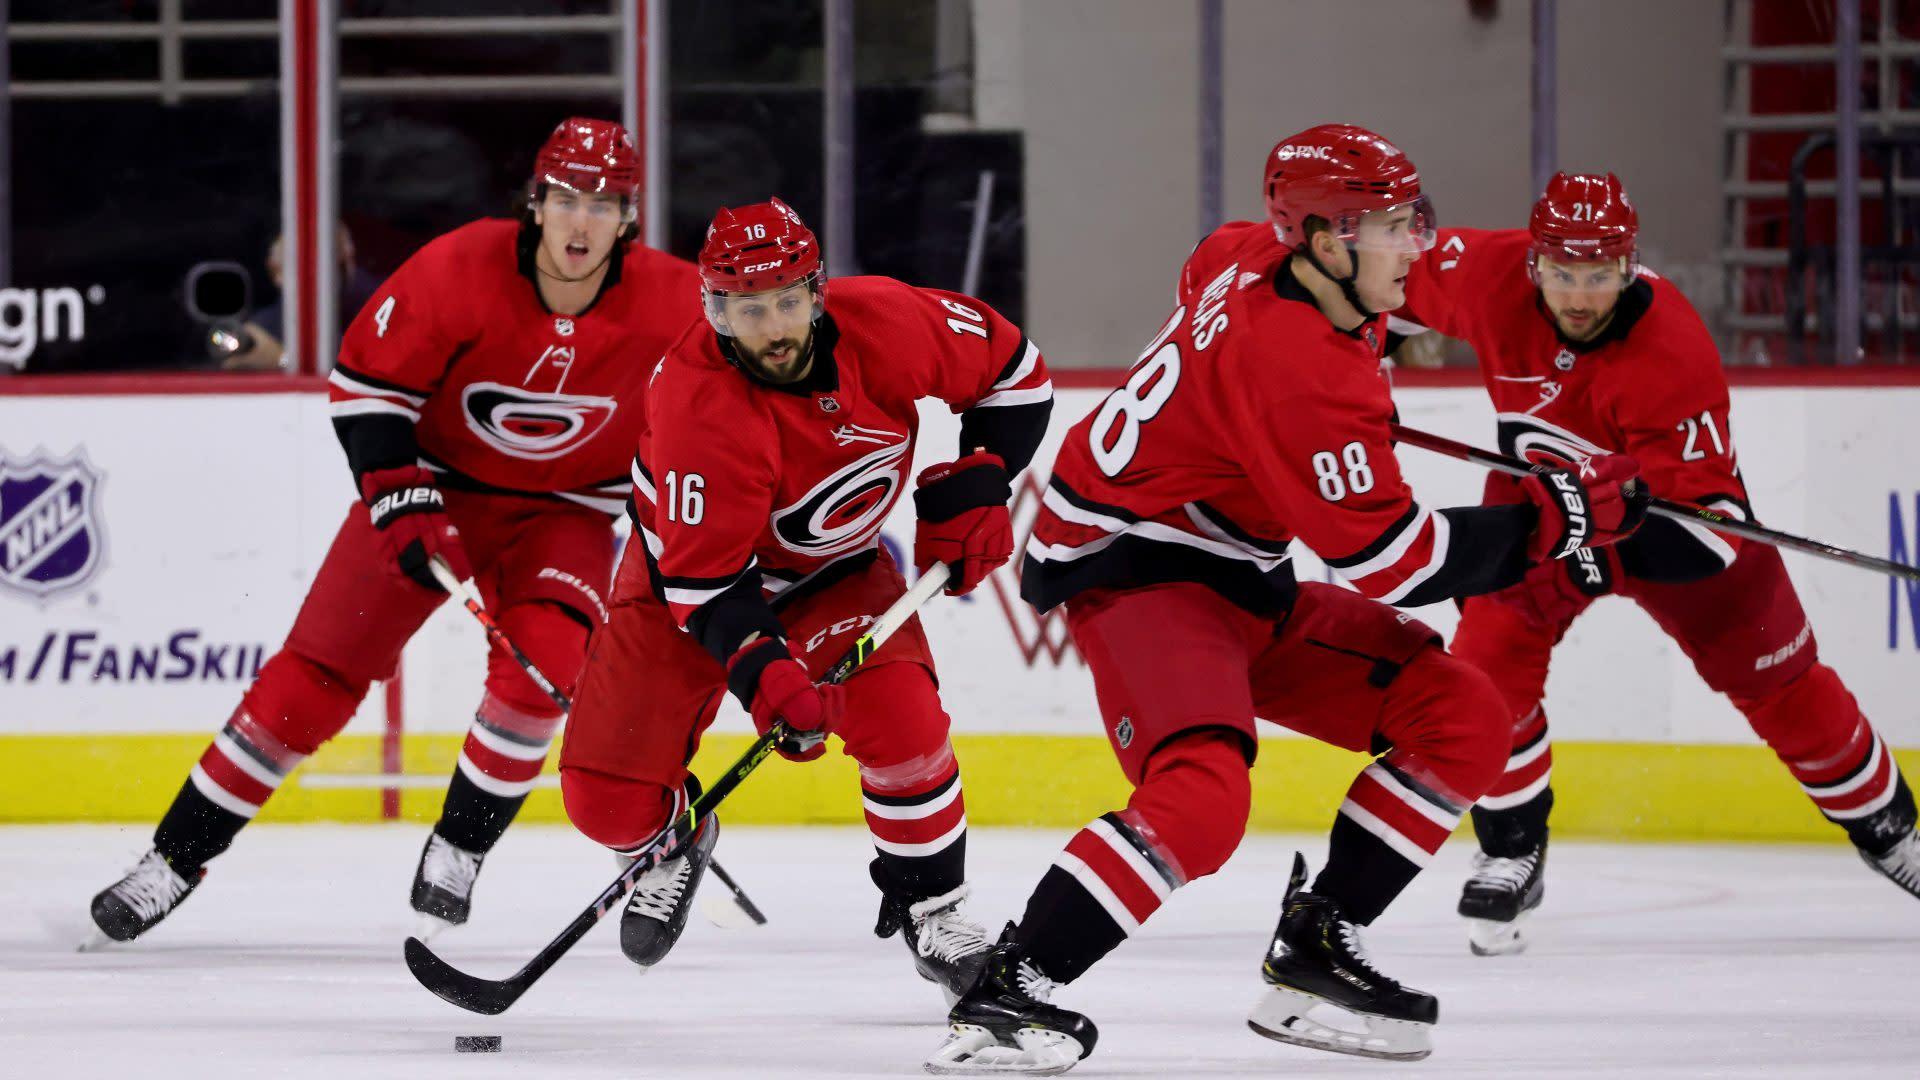 NHL Power Rankings: Hurricanes, Islanders climb rankings with winning streaks